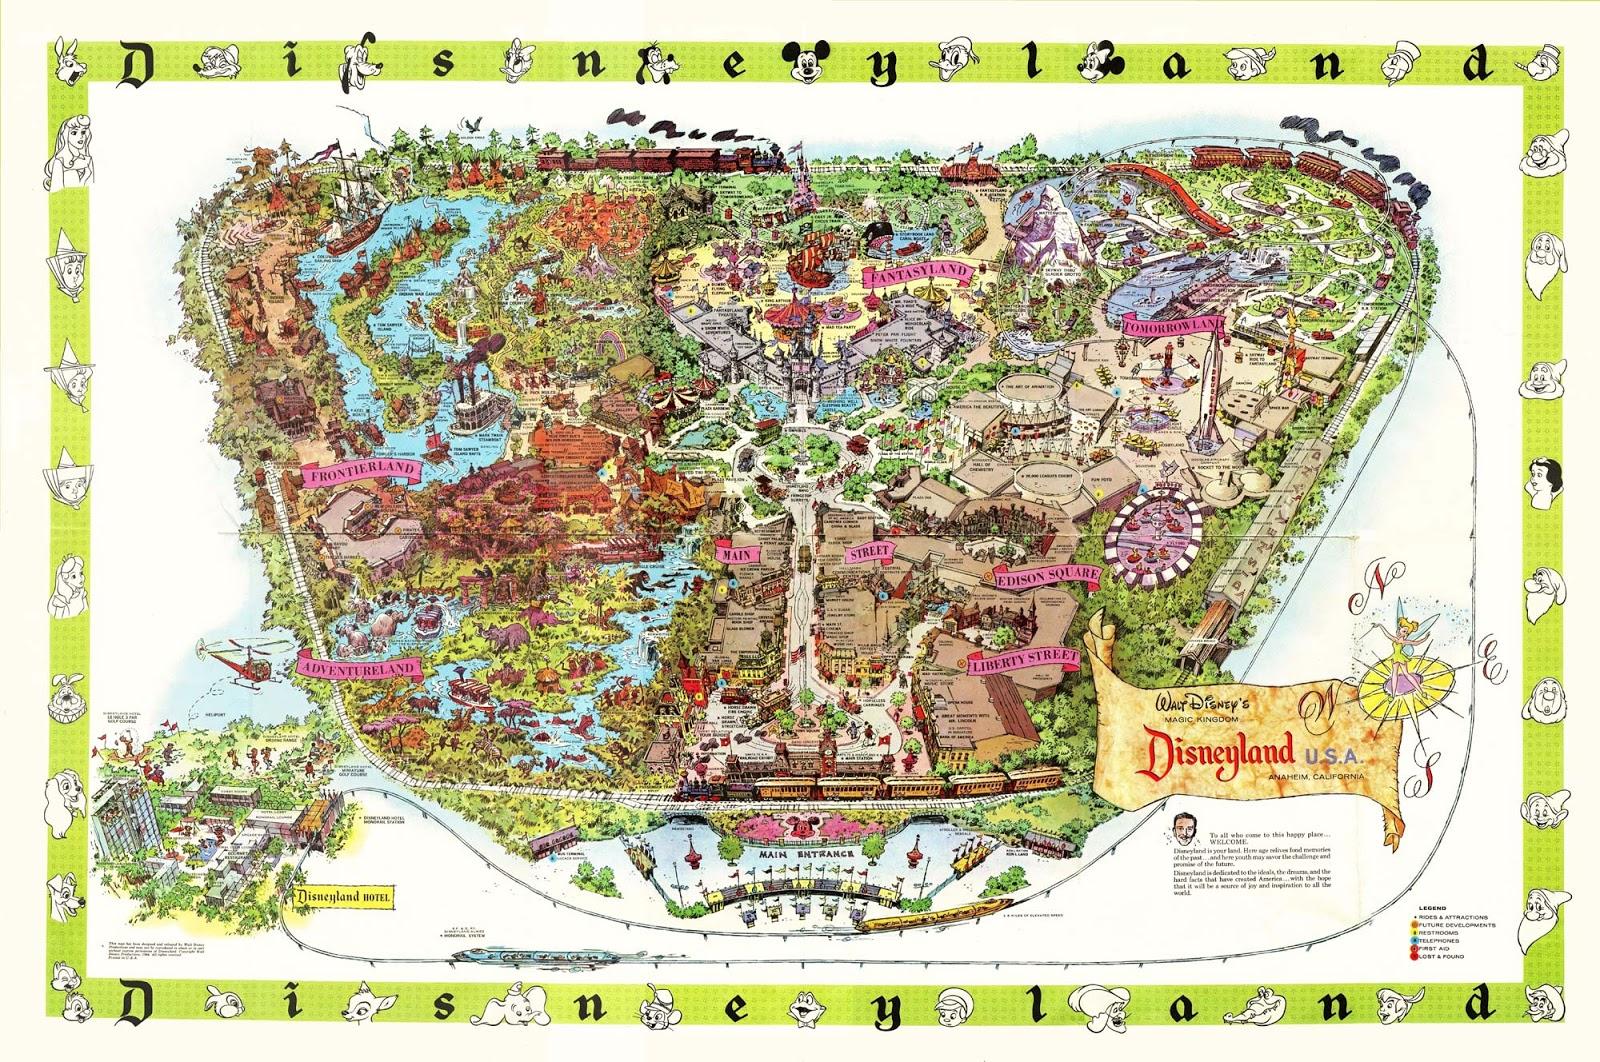 1964 Disneyland Map